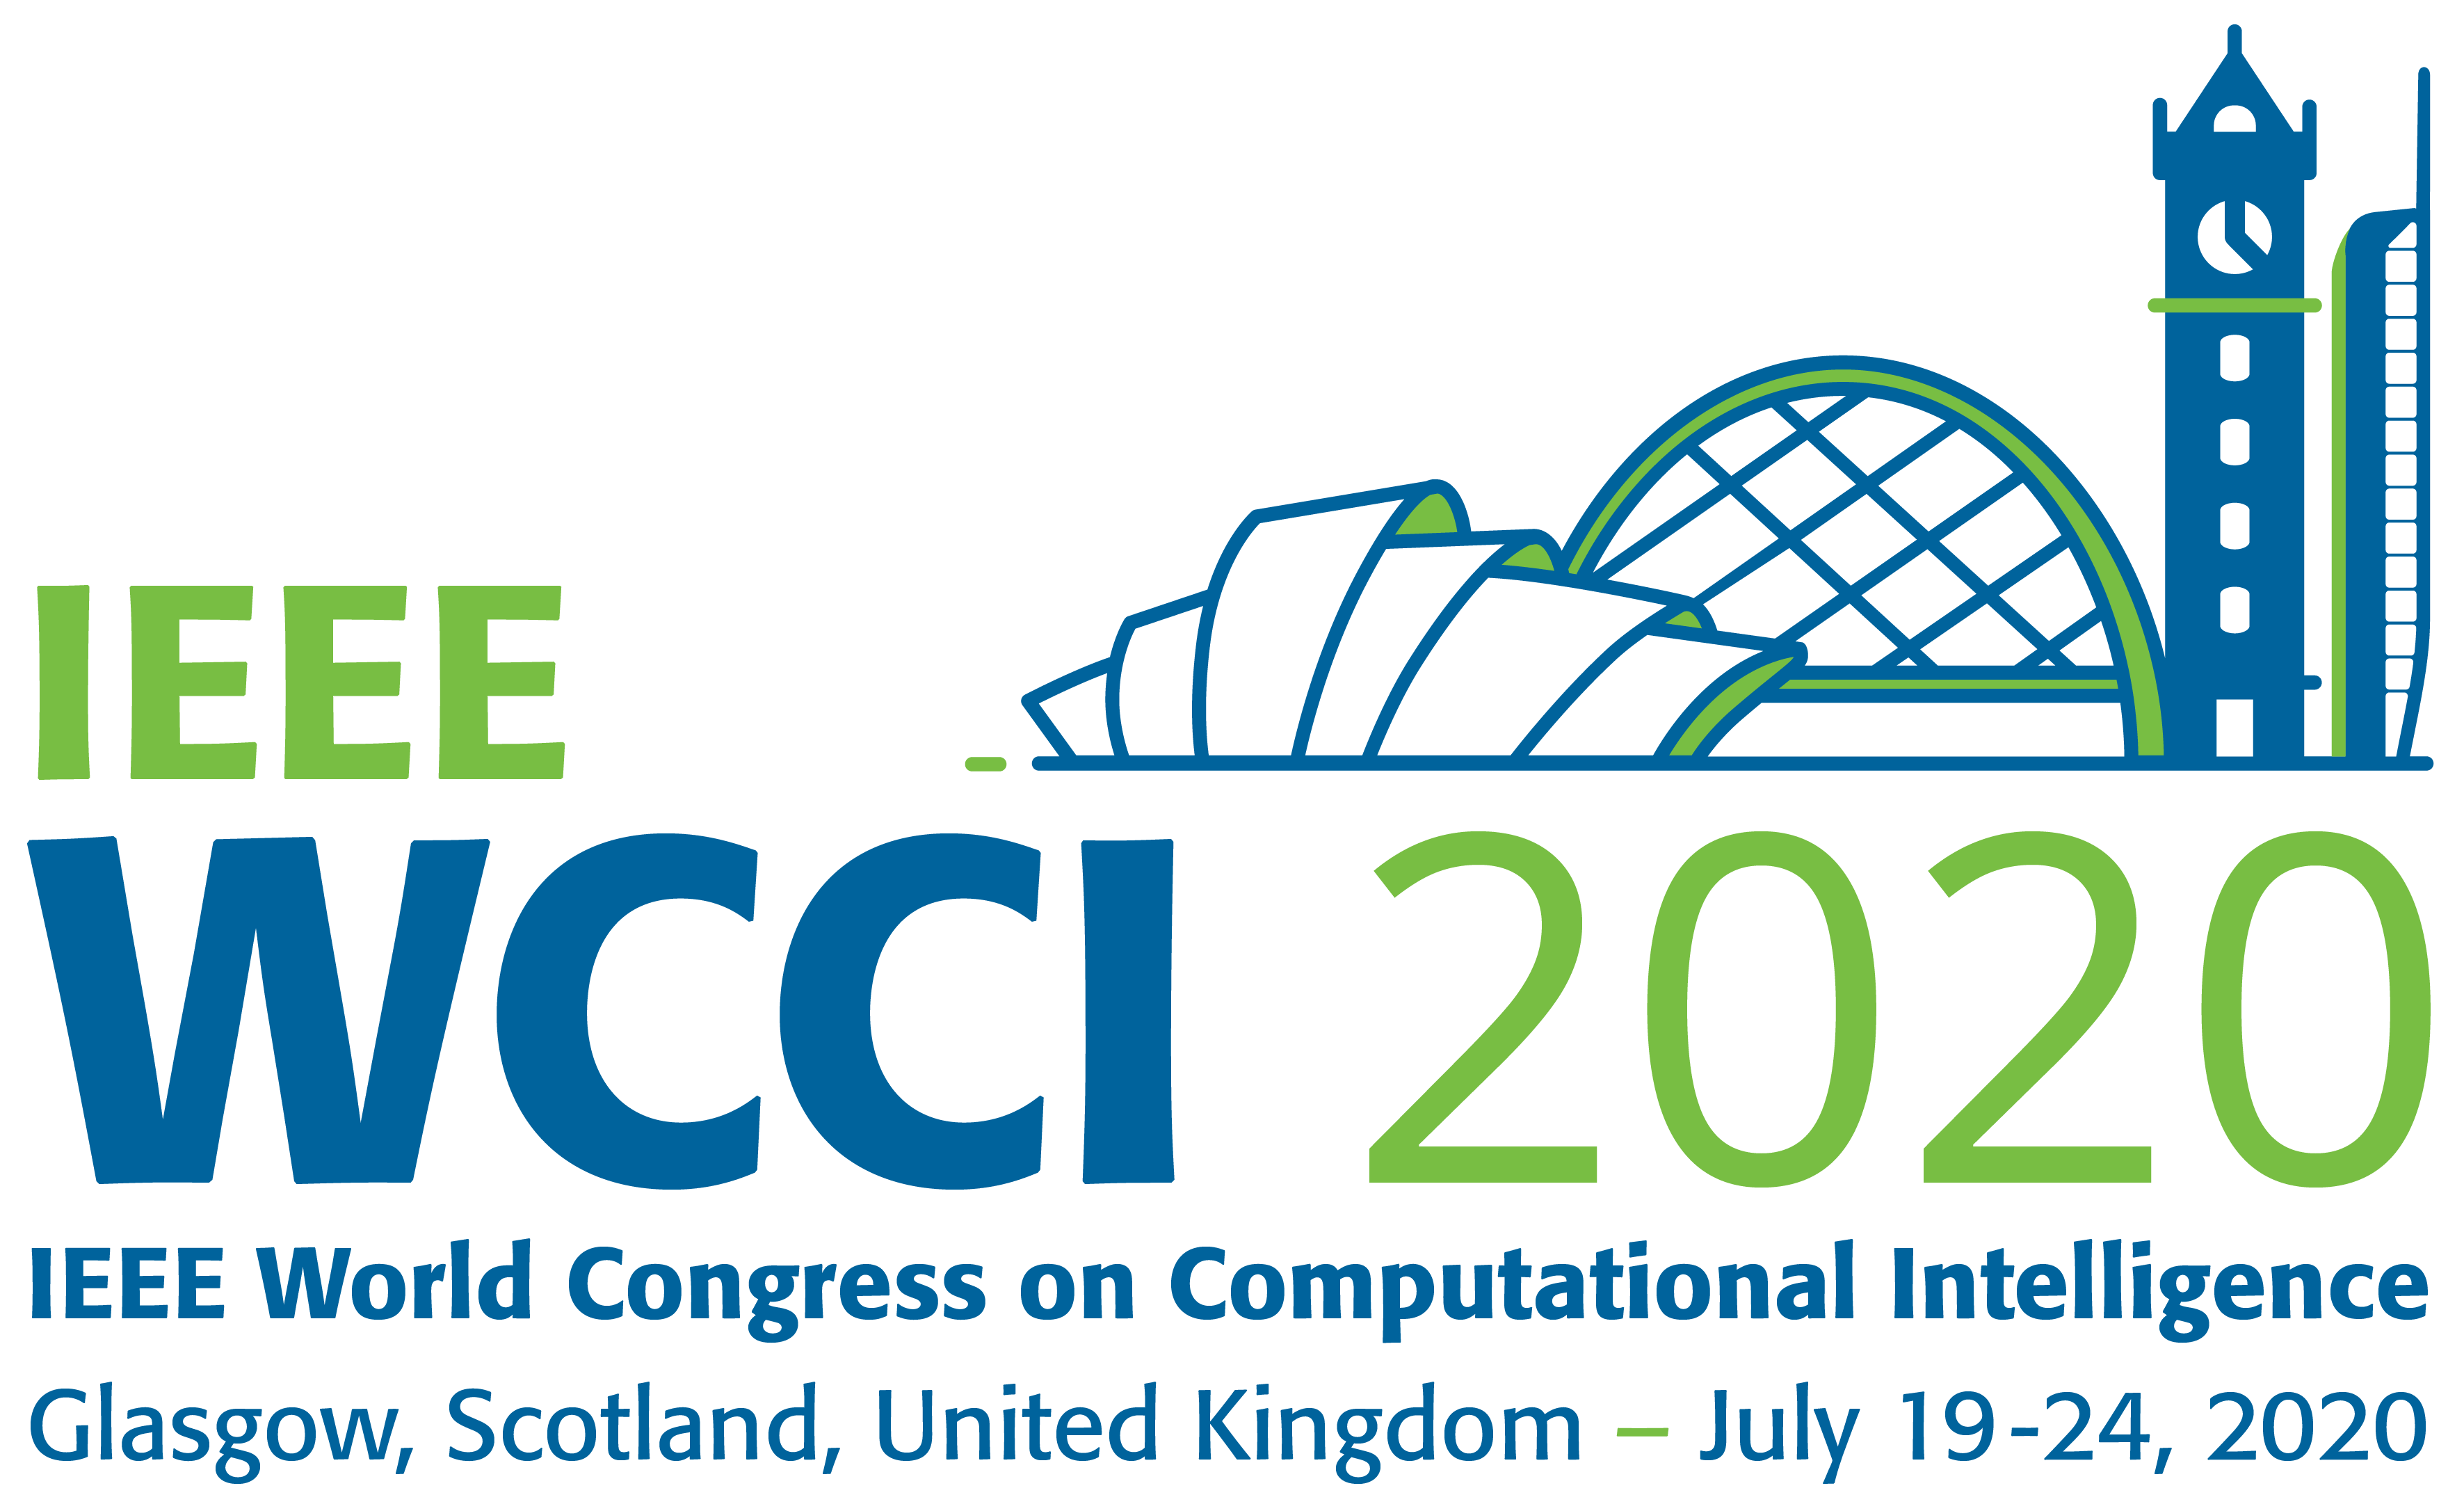 IEEE WCCI 2020